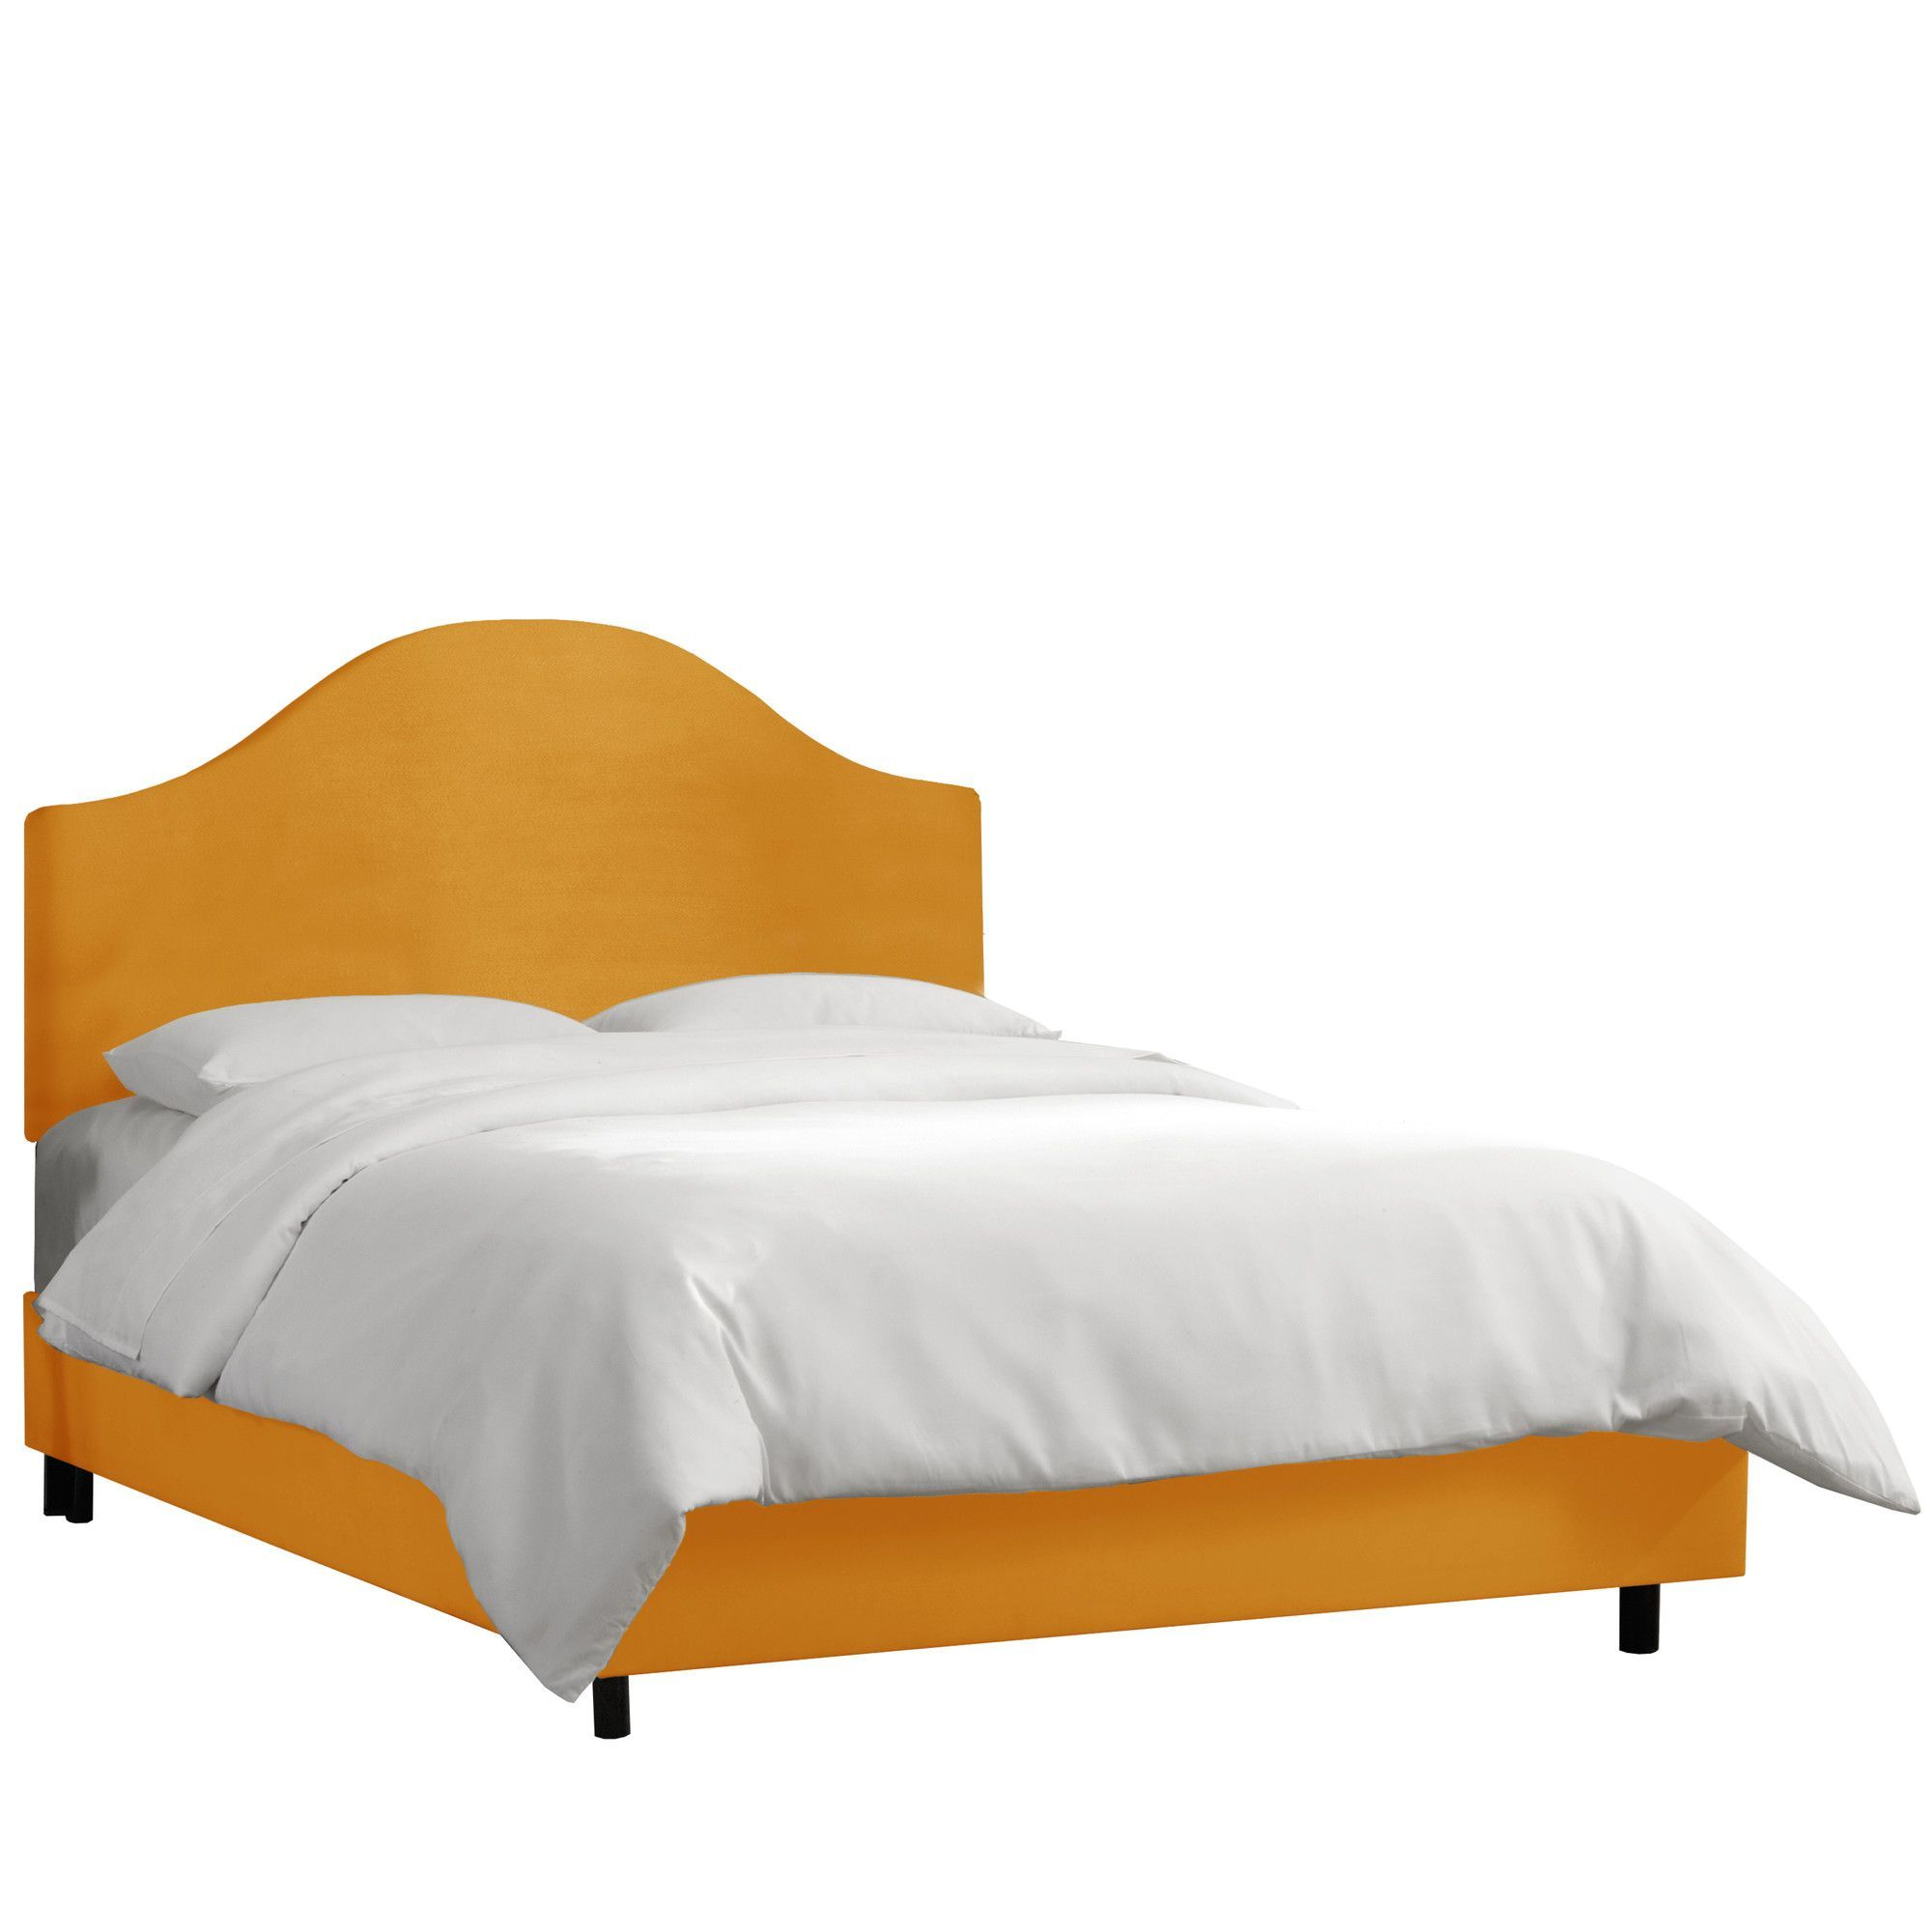 regal upholstered panel bed beds online platform beds and products